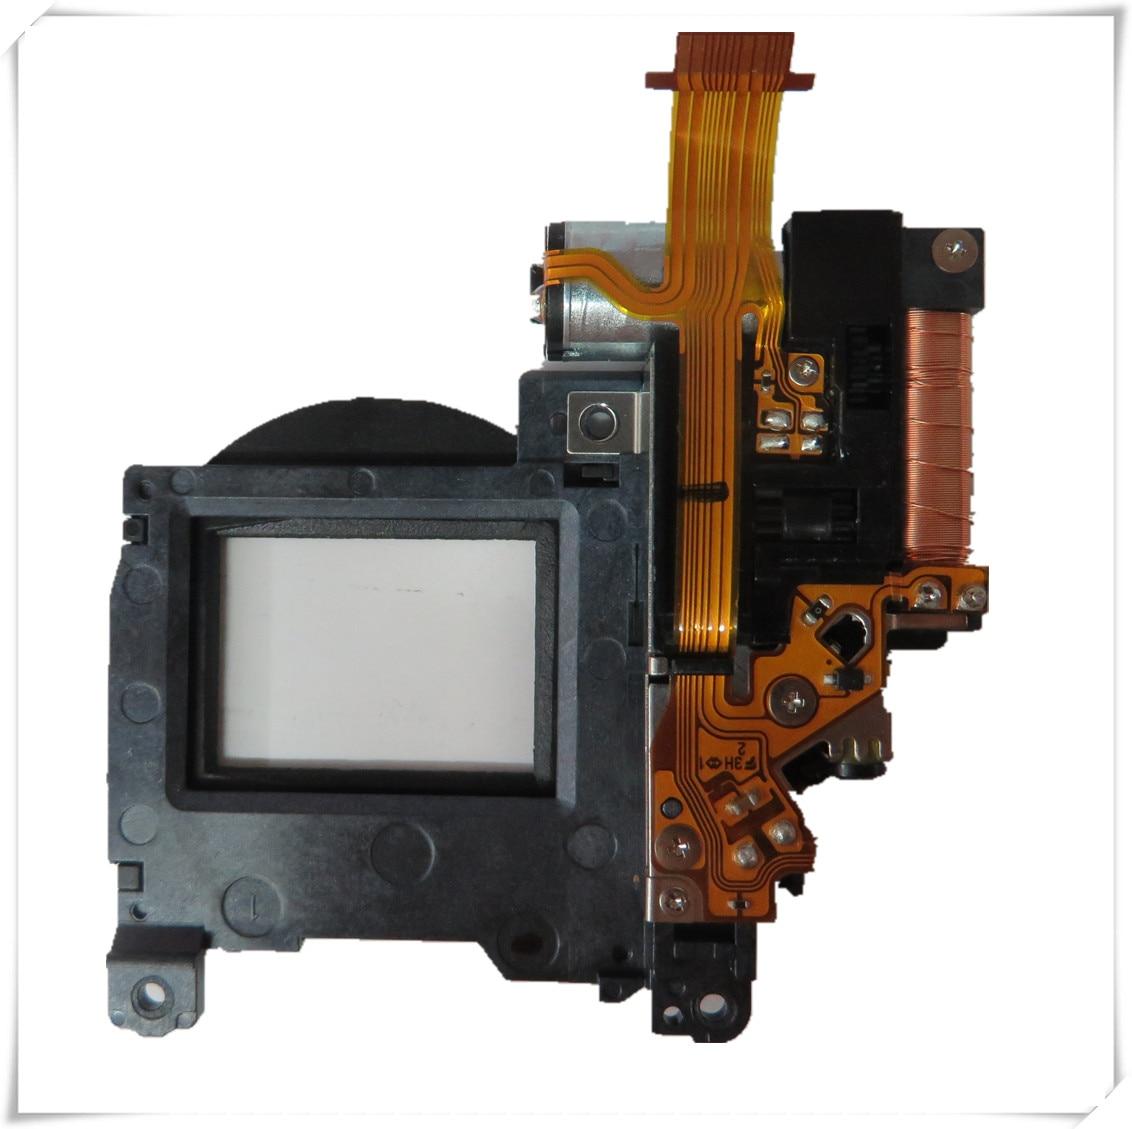 100% Original  Shutter Assembly Group unit For Canon EOS M2 / EOSM2 for EOS M3 Digital Camera Repair Part